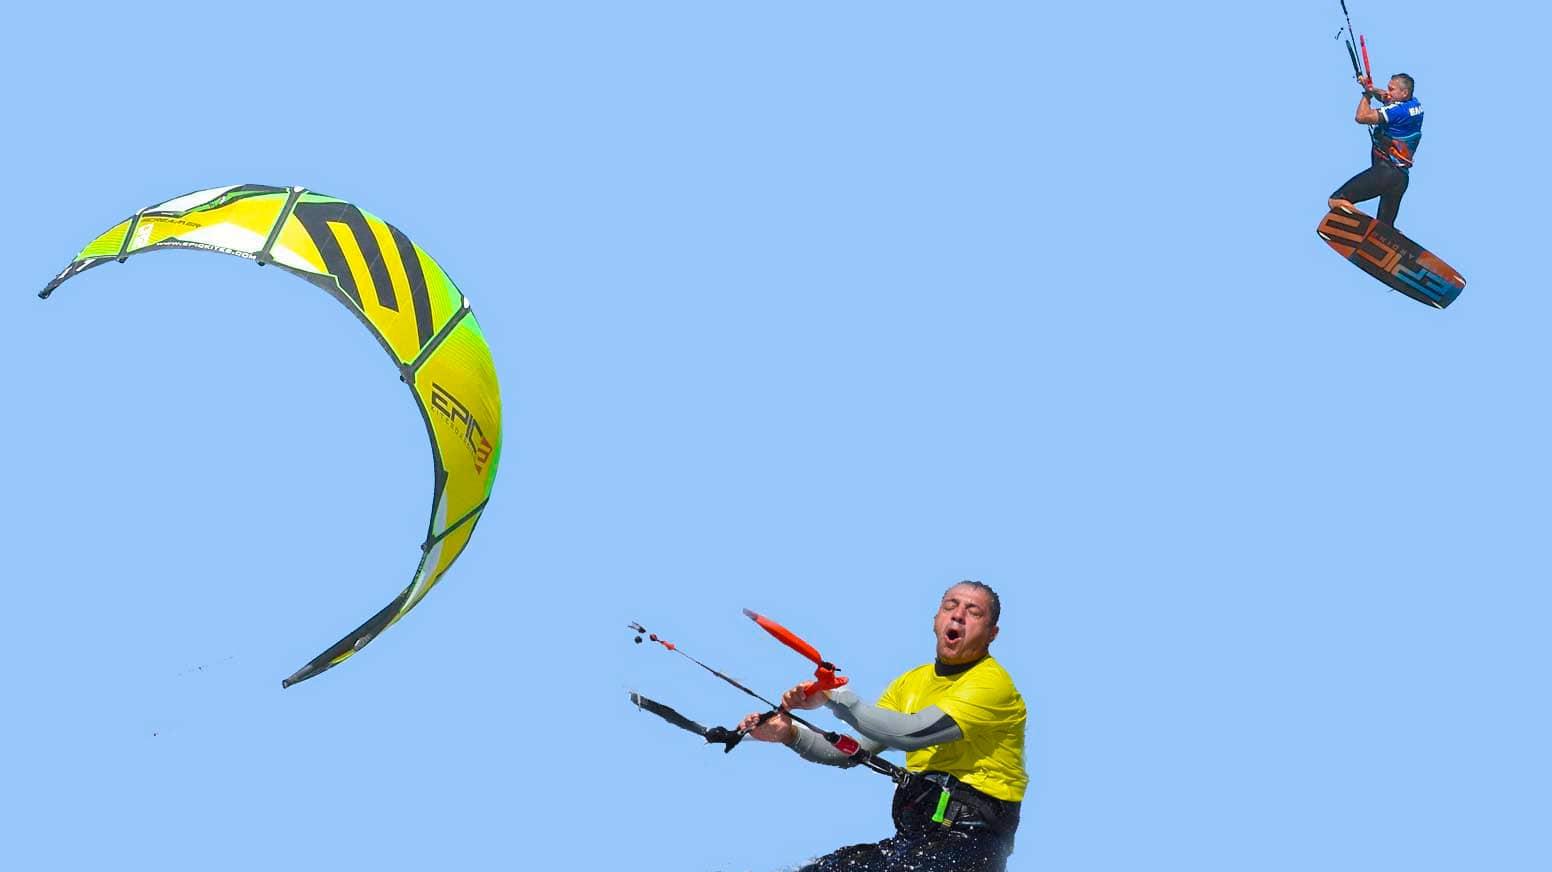 Dumb and Dumber kitesurfing - with Epic Kites Kiteboarding